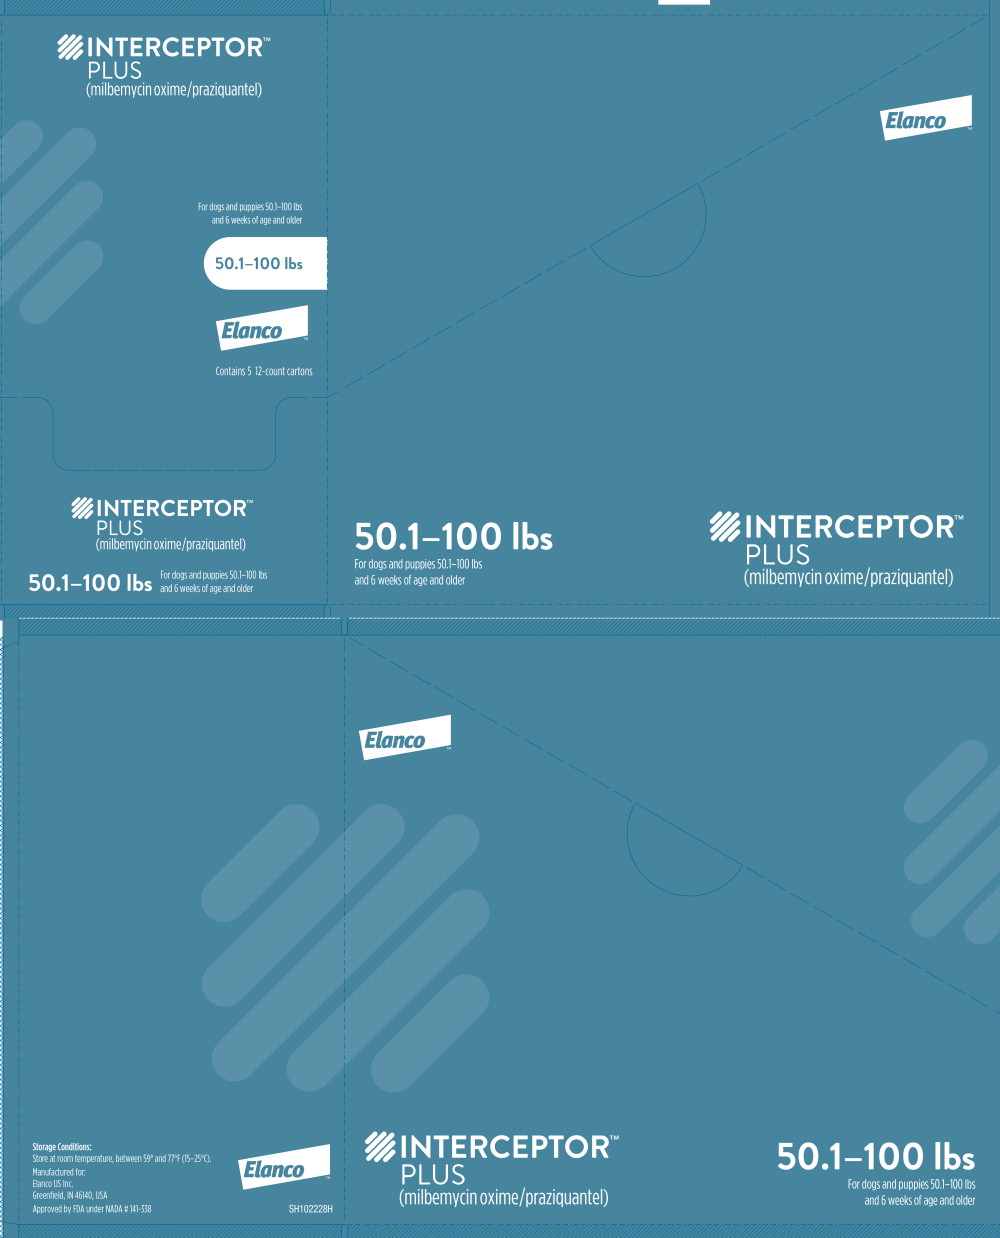 Principal Display Panel - Interceptor Plus 50.1-100 lbs Box Label